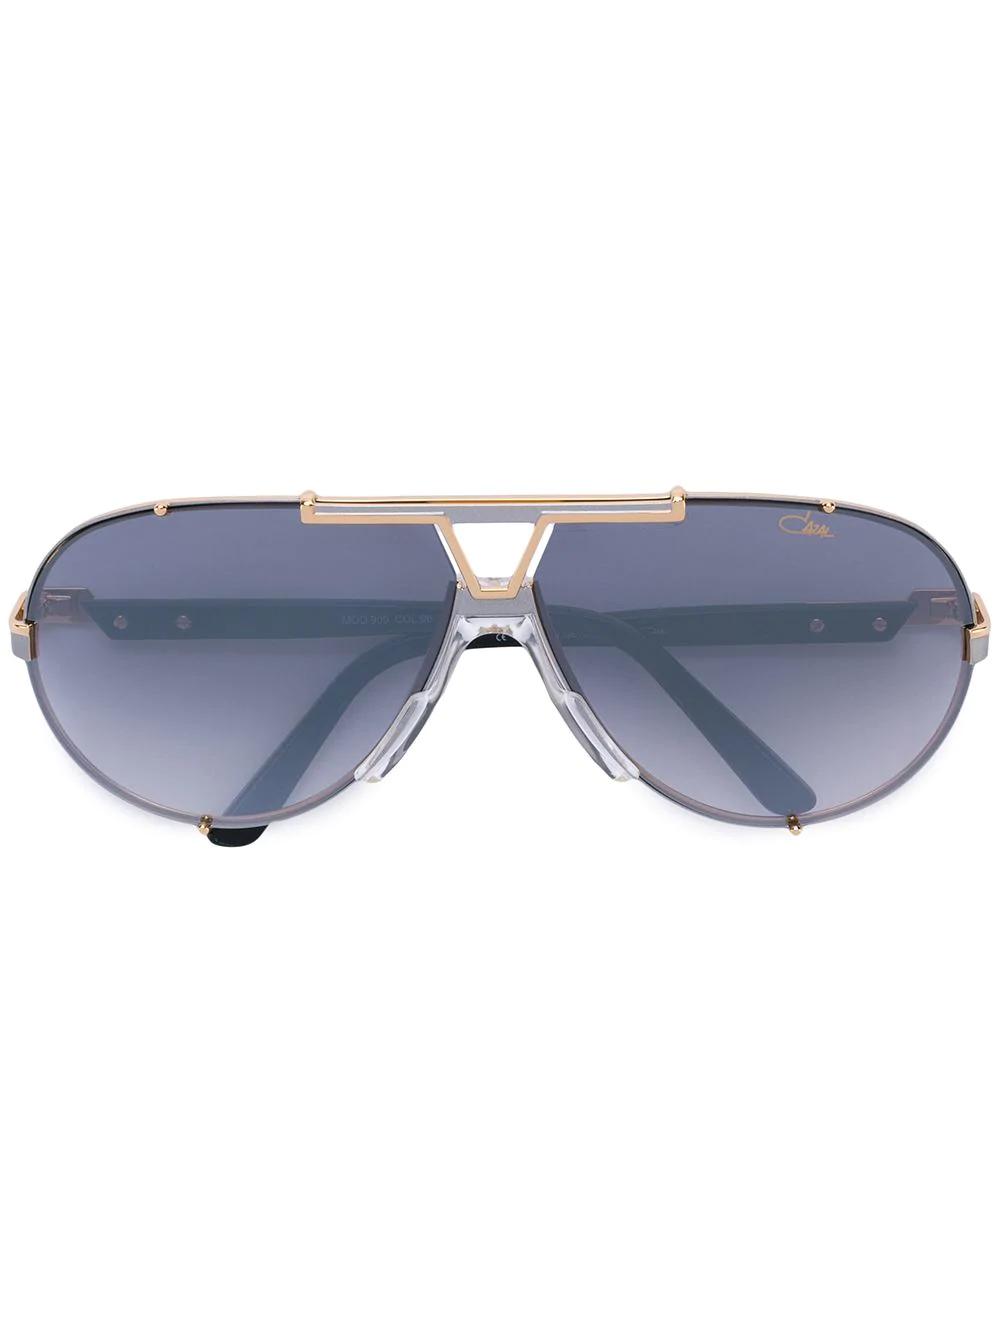 c599283eb0c2 Cazal Gradient Aviator Sunglasses - Metallic | ModeSens